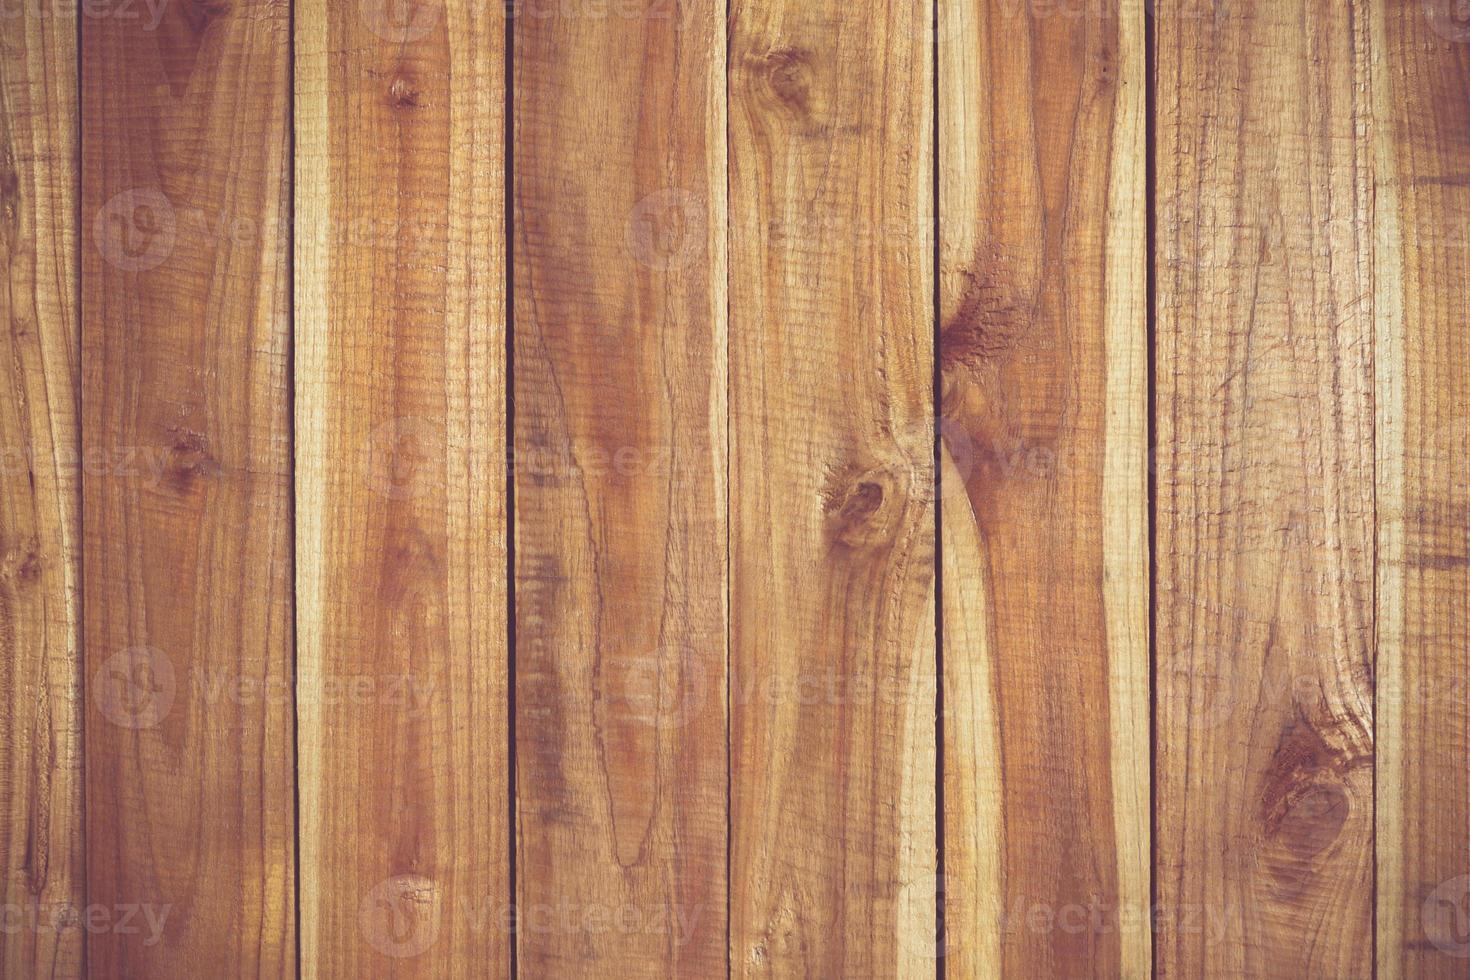 Old wood pattern background photo